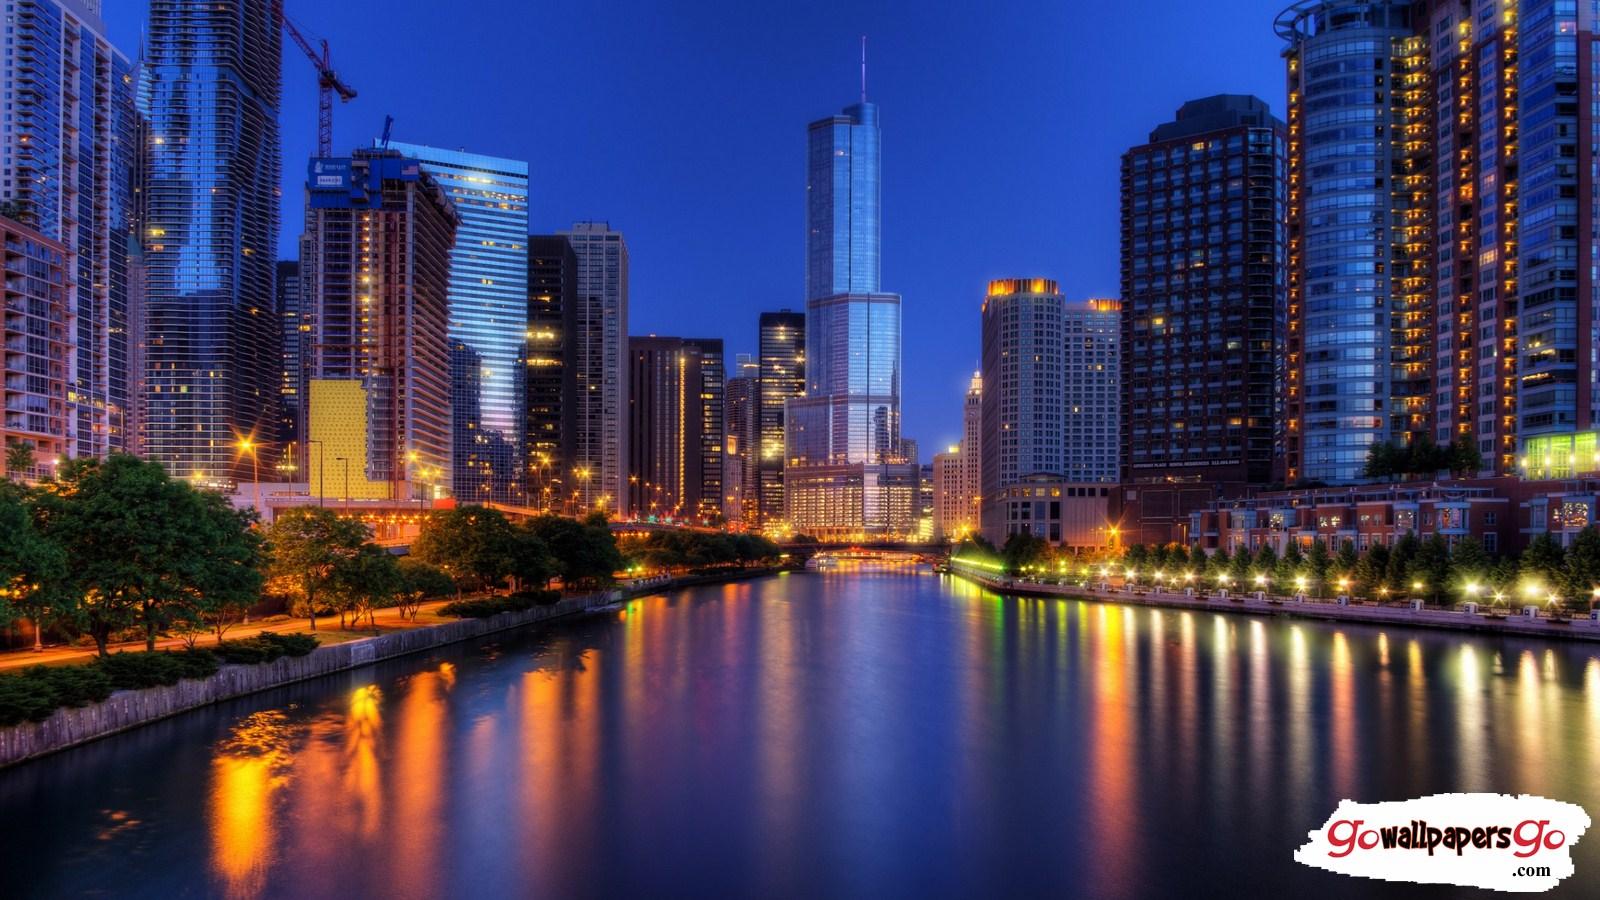 196 1969475 beautiful city night look wallpaper chicago night